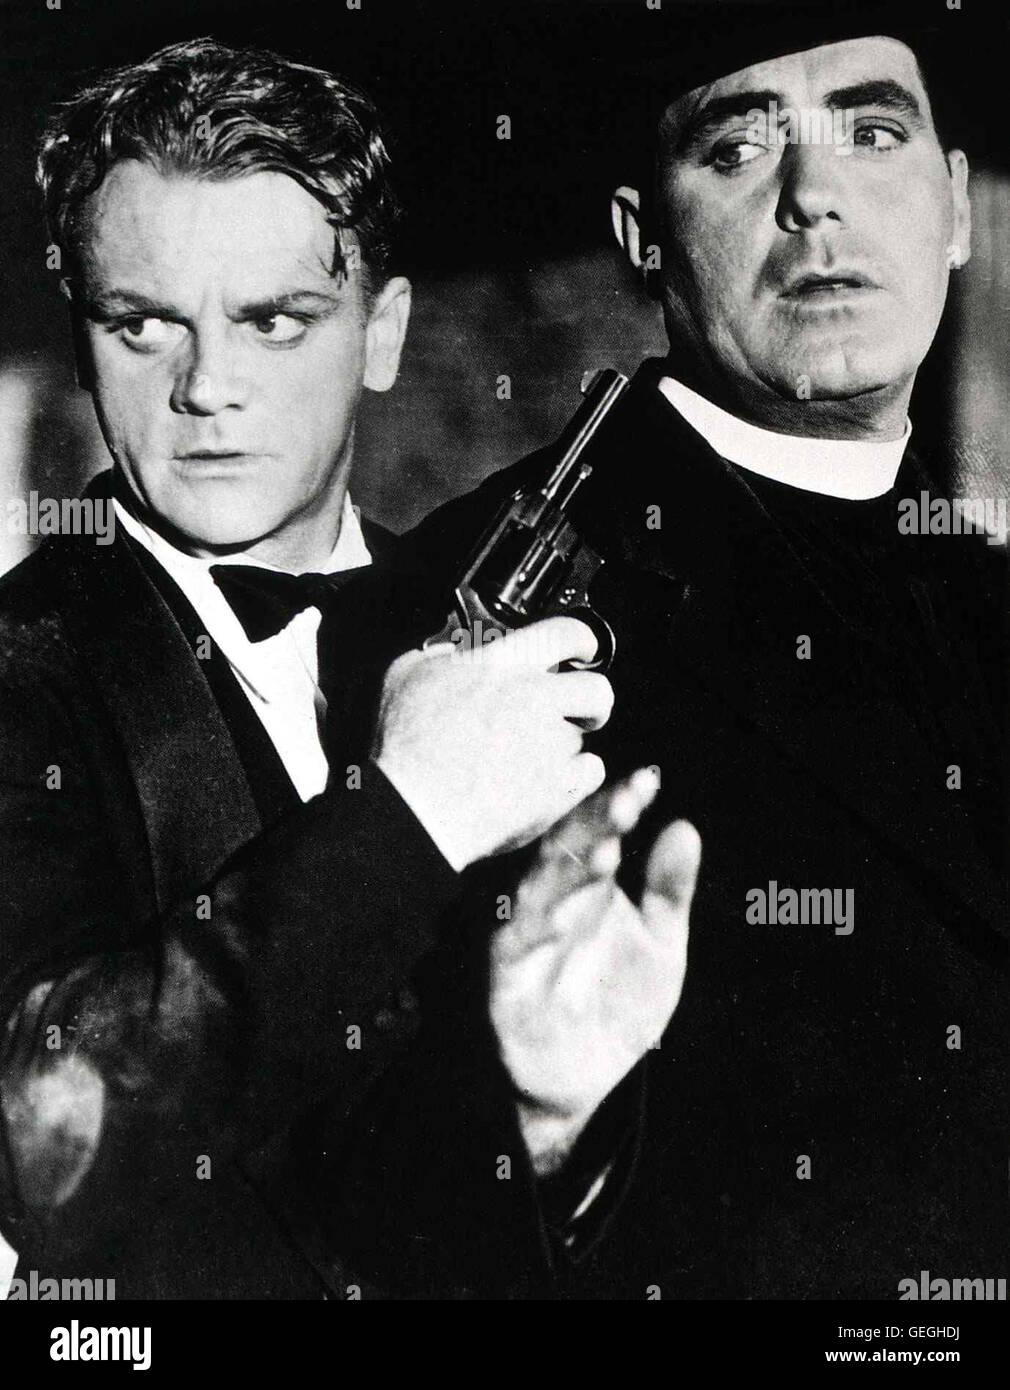 James Gagney, Pat O'Brian *** Local Caption *** 1938, Angels With Dirty Faces, Chicago - Engel Mit Schmutzigen Gesichtern Stock Photo